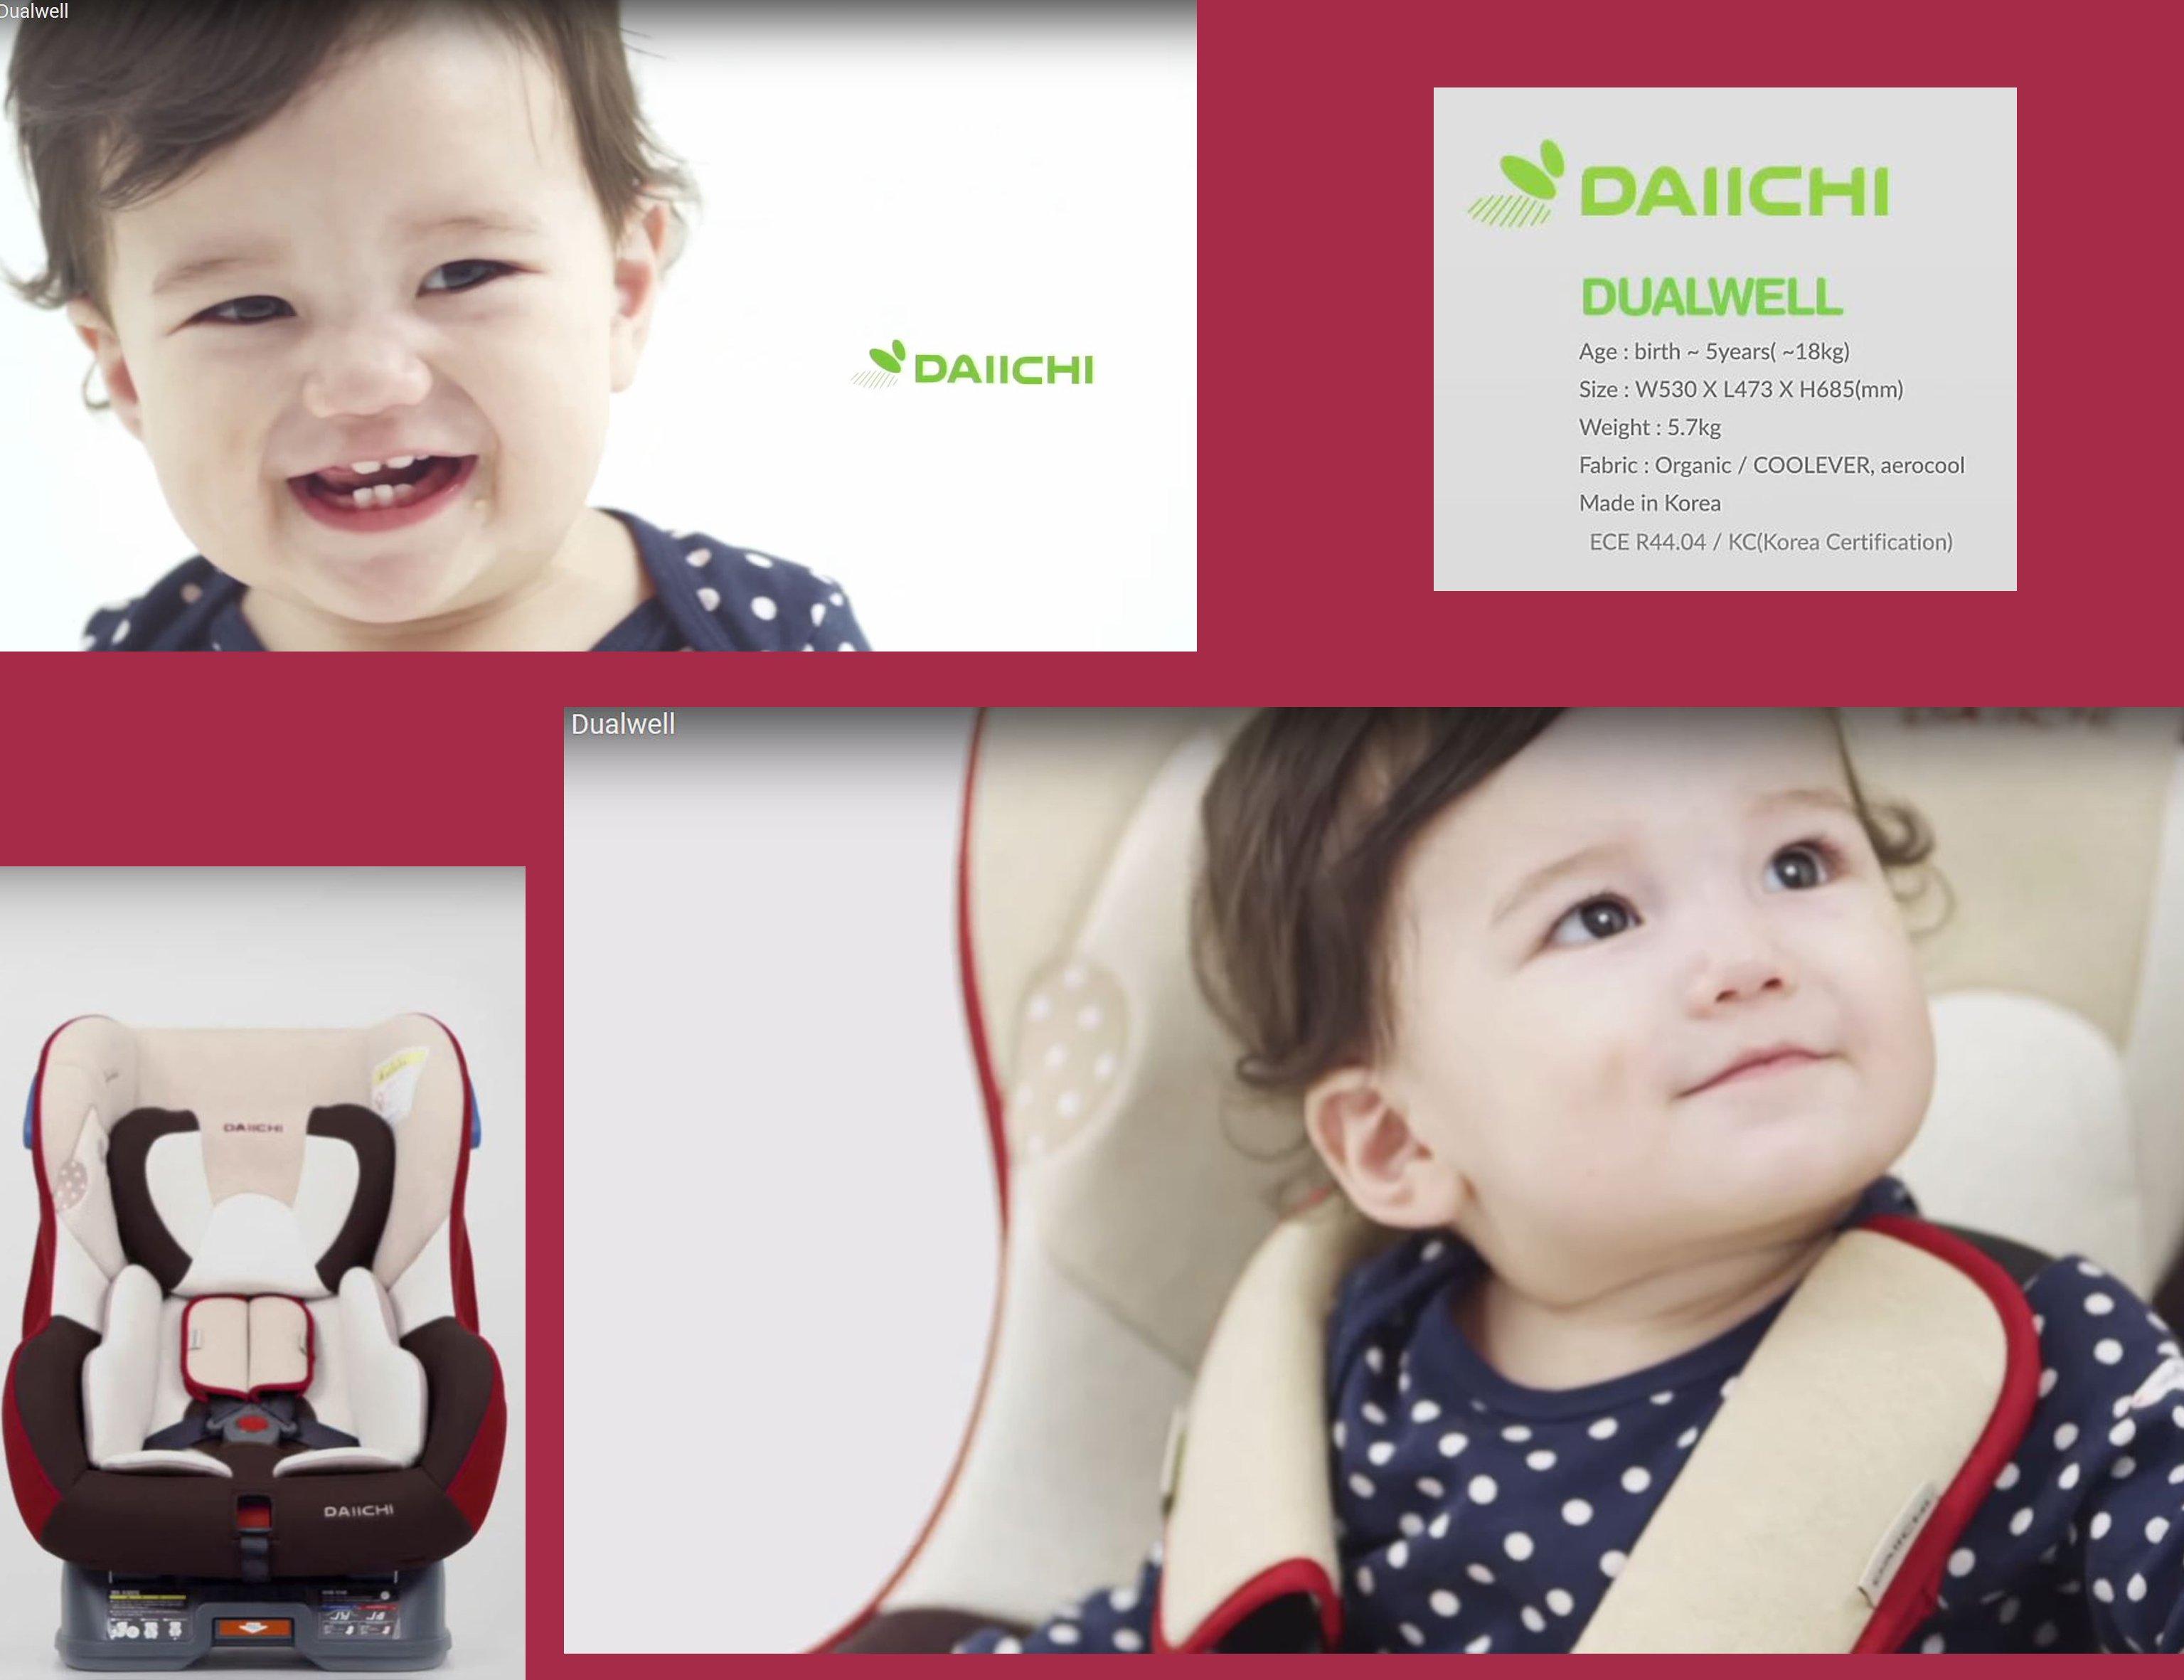 DAIICHI CAR SEAT DUALWELL ORGANIC RED Features 2